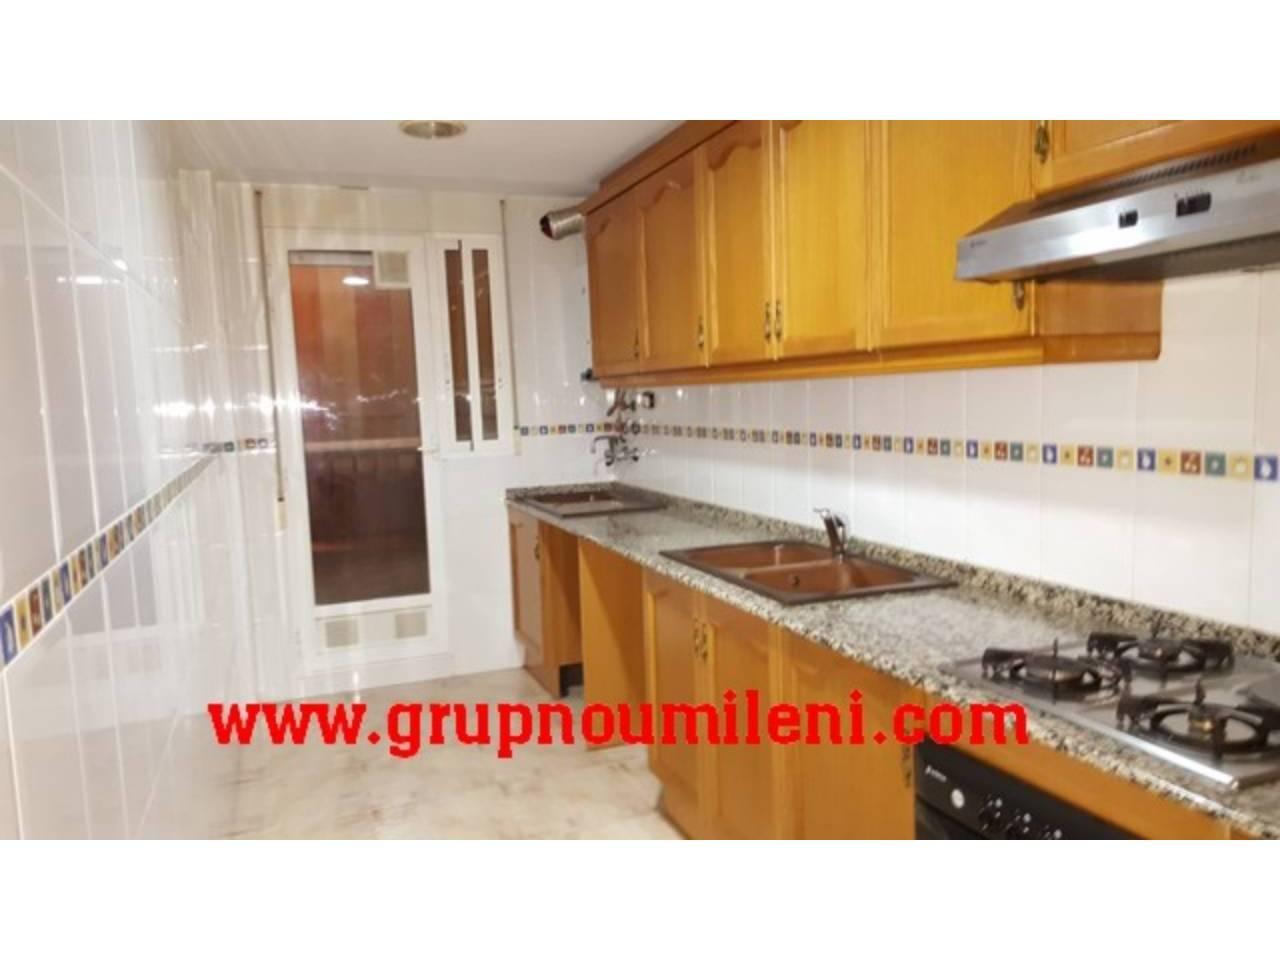 Location Appartement  Albal. Superf. 90 m²,  3 habitaciones (1 doble,  2 individuales),  2 ba